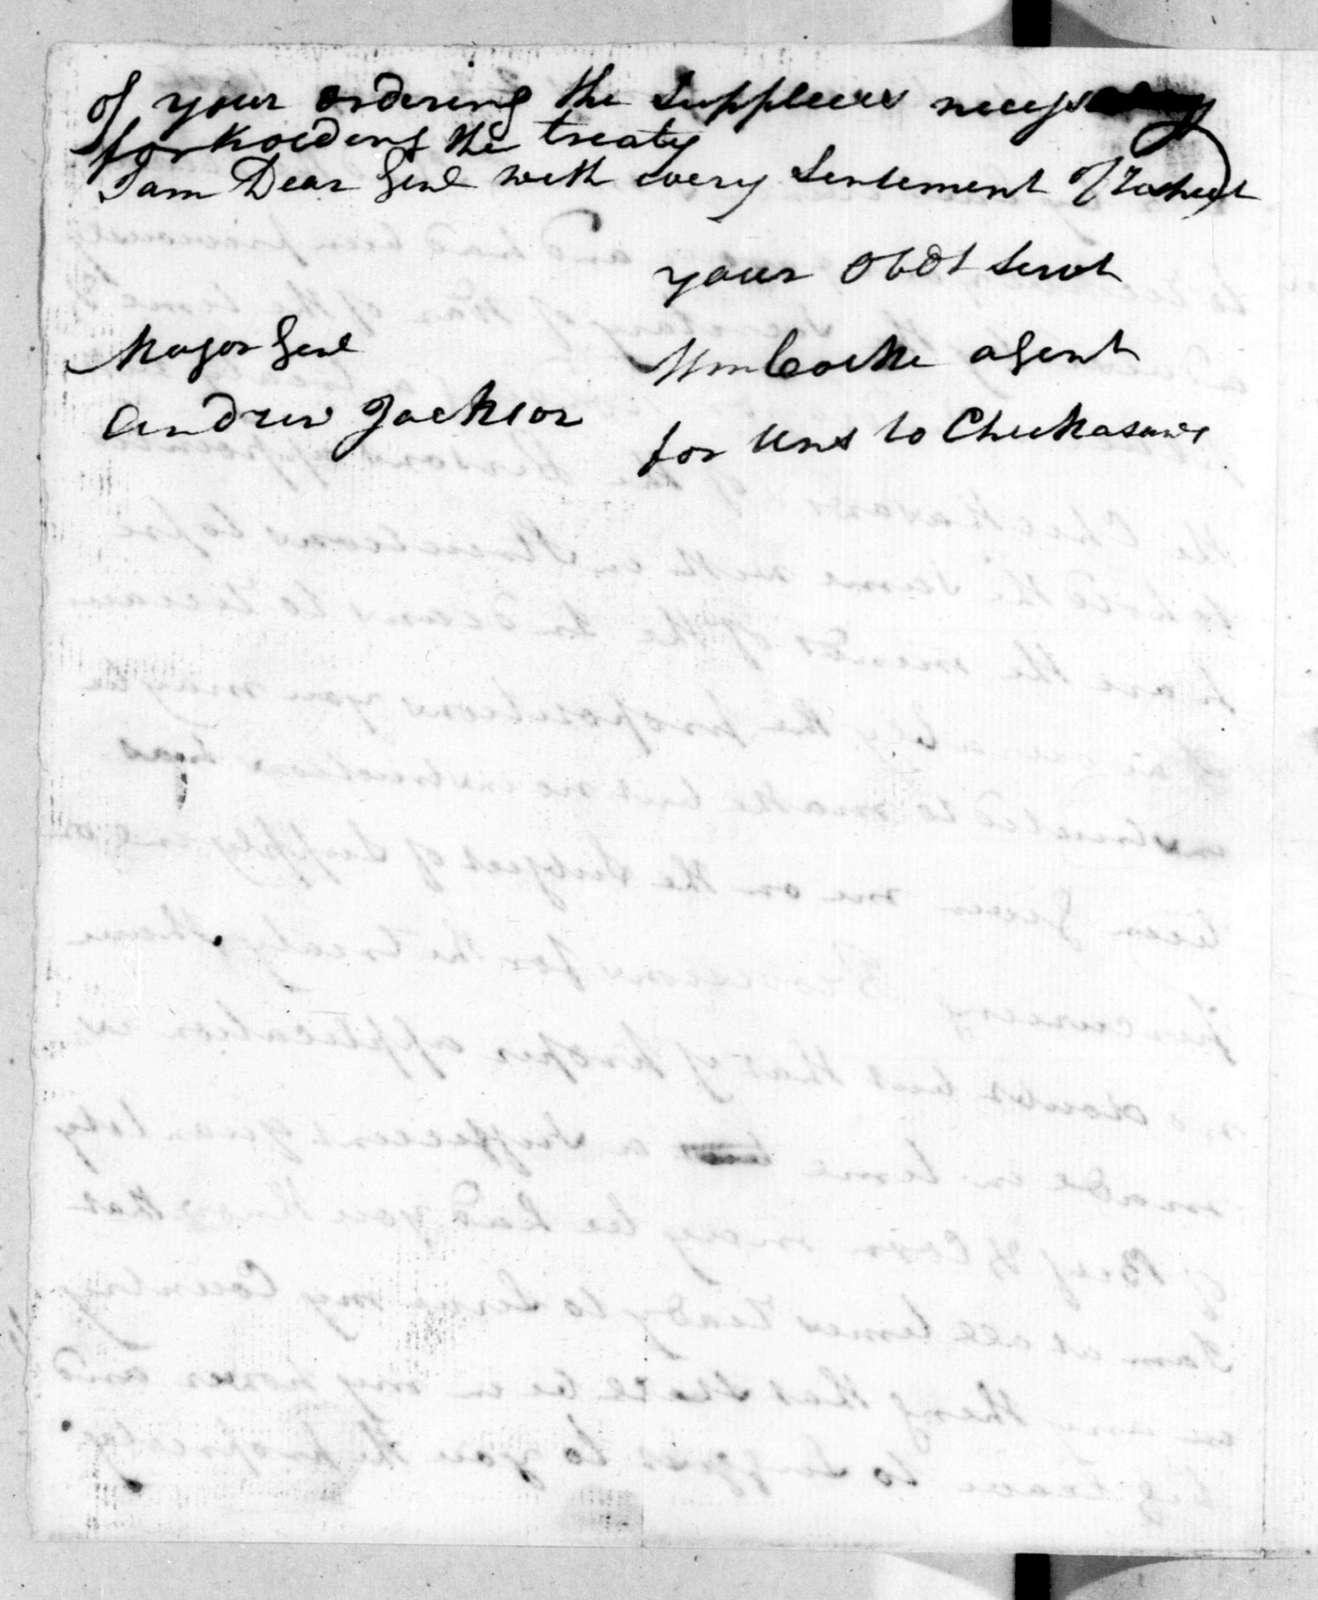 William Cocke to Andrew Jackson, July 22, 1816